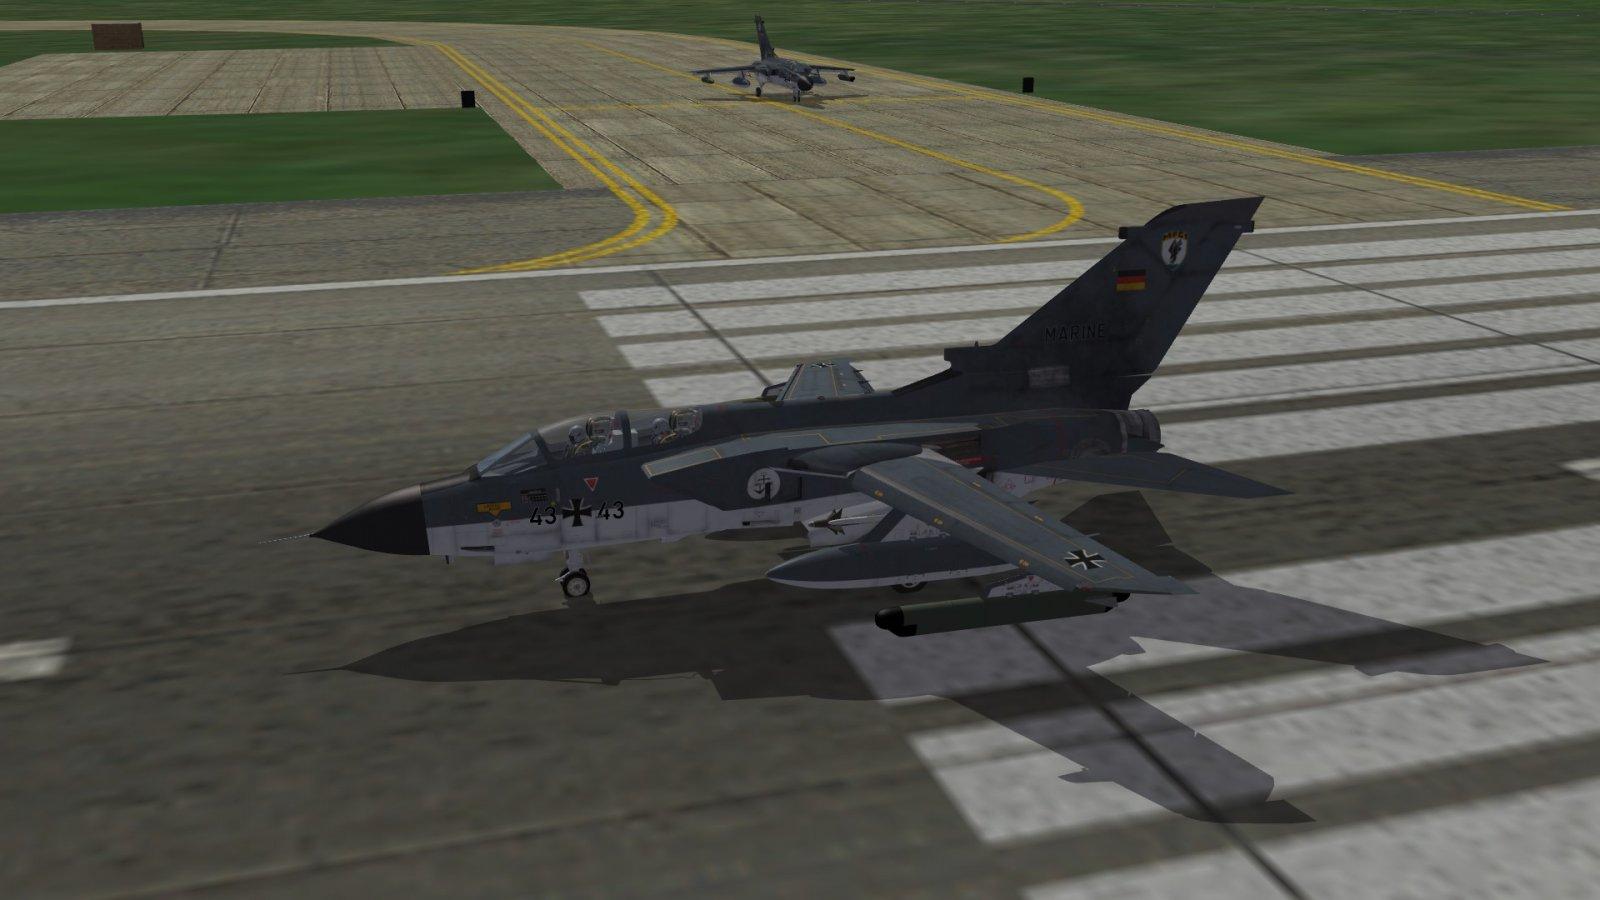 Tornado-Ids00016.JPG